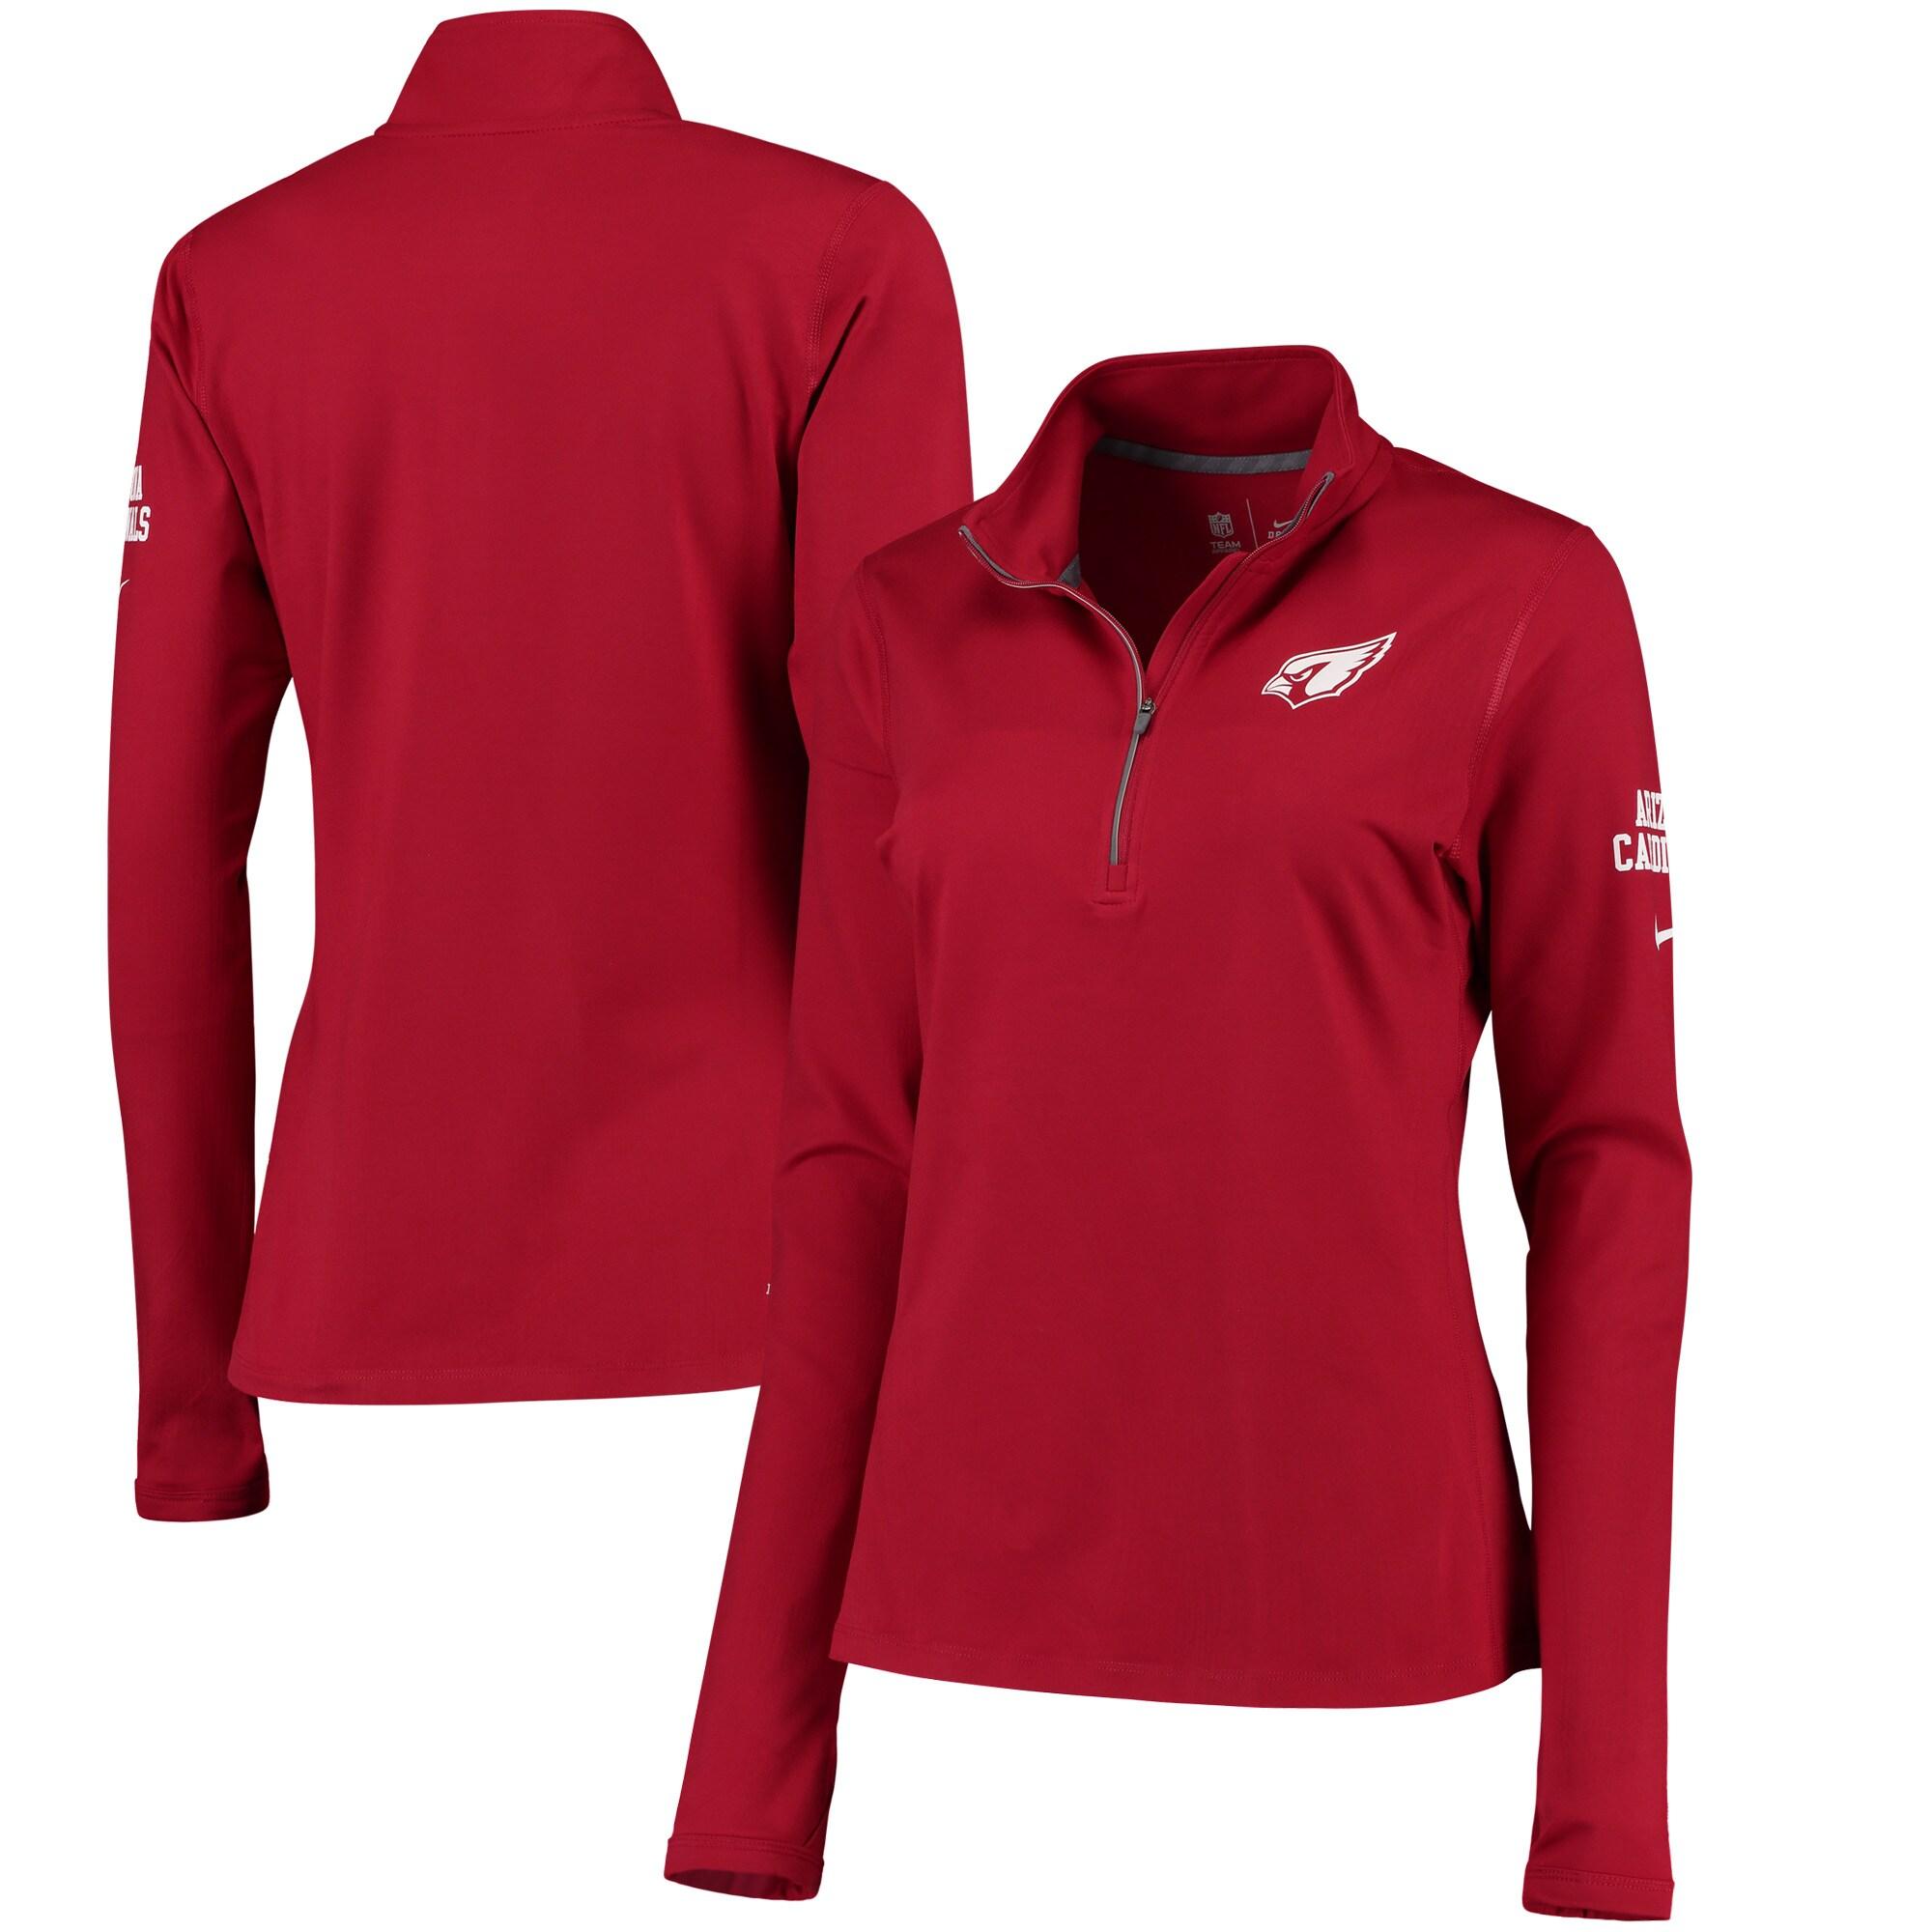 Arizona Cardinals Nike Women's Tailgate Element Half-Zip Performance Jacket - Cardinal